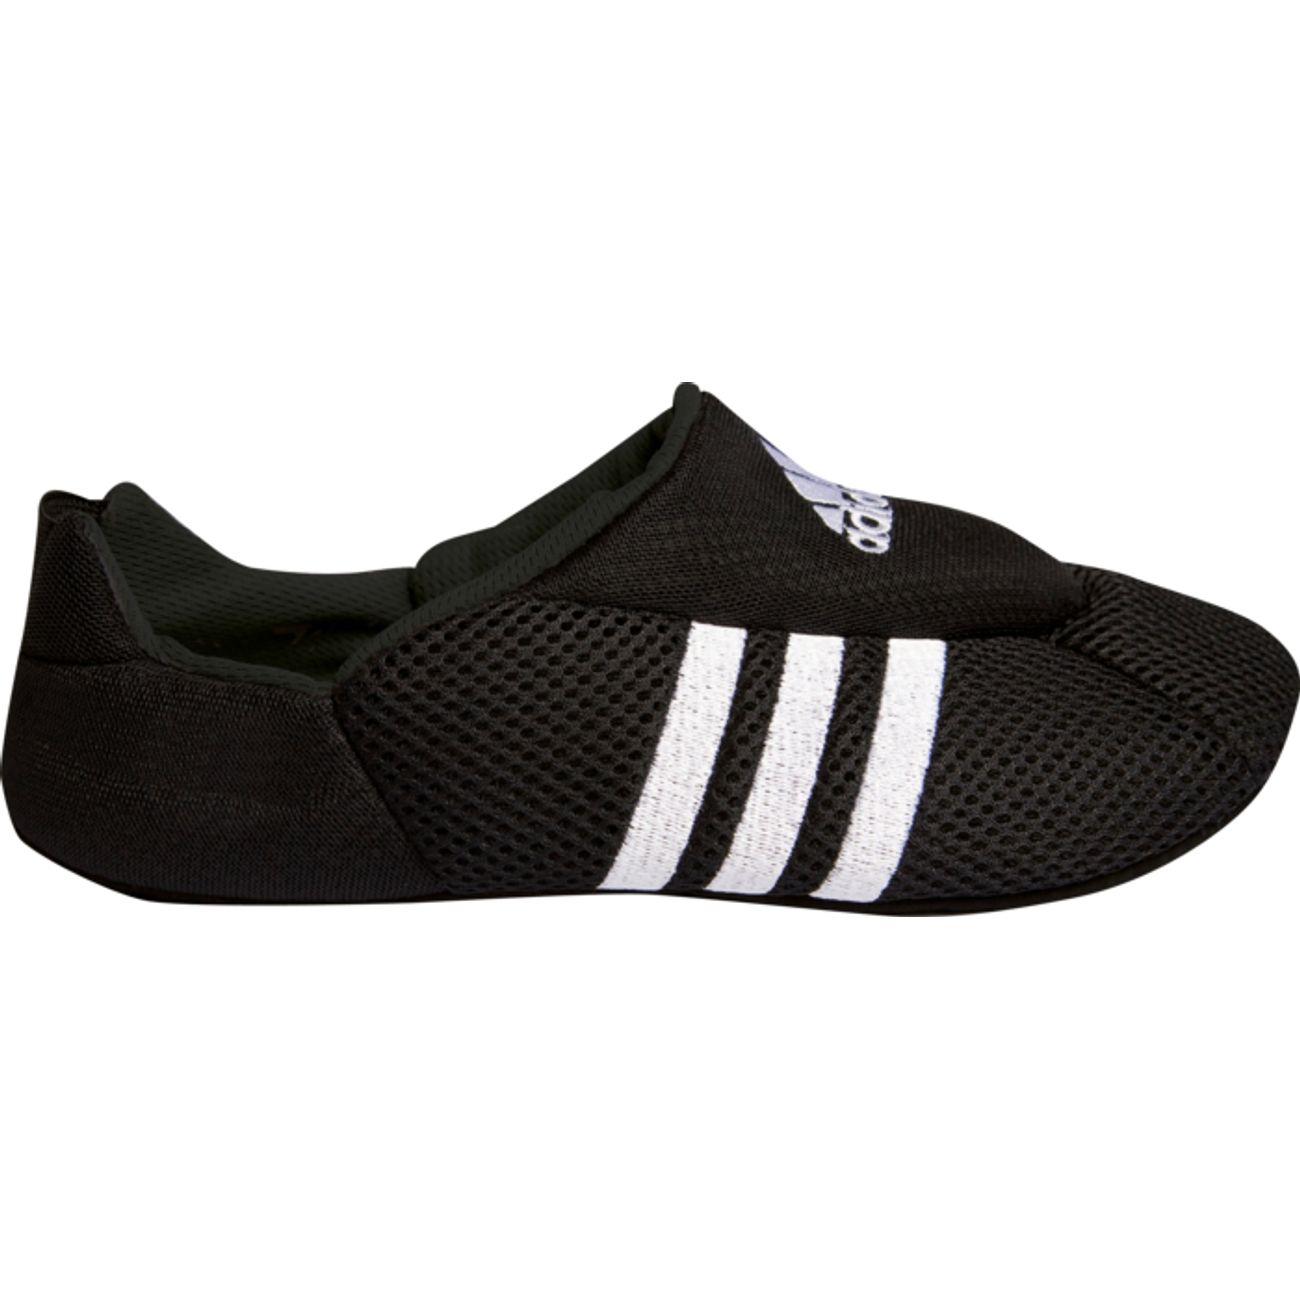 Baskets Noirbleu Noir Chaussures Vapormax Nike Plus Basses Air gn1qxaB